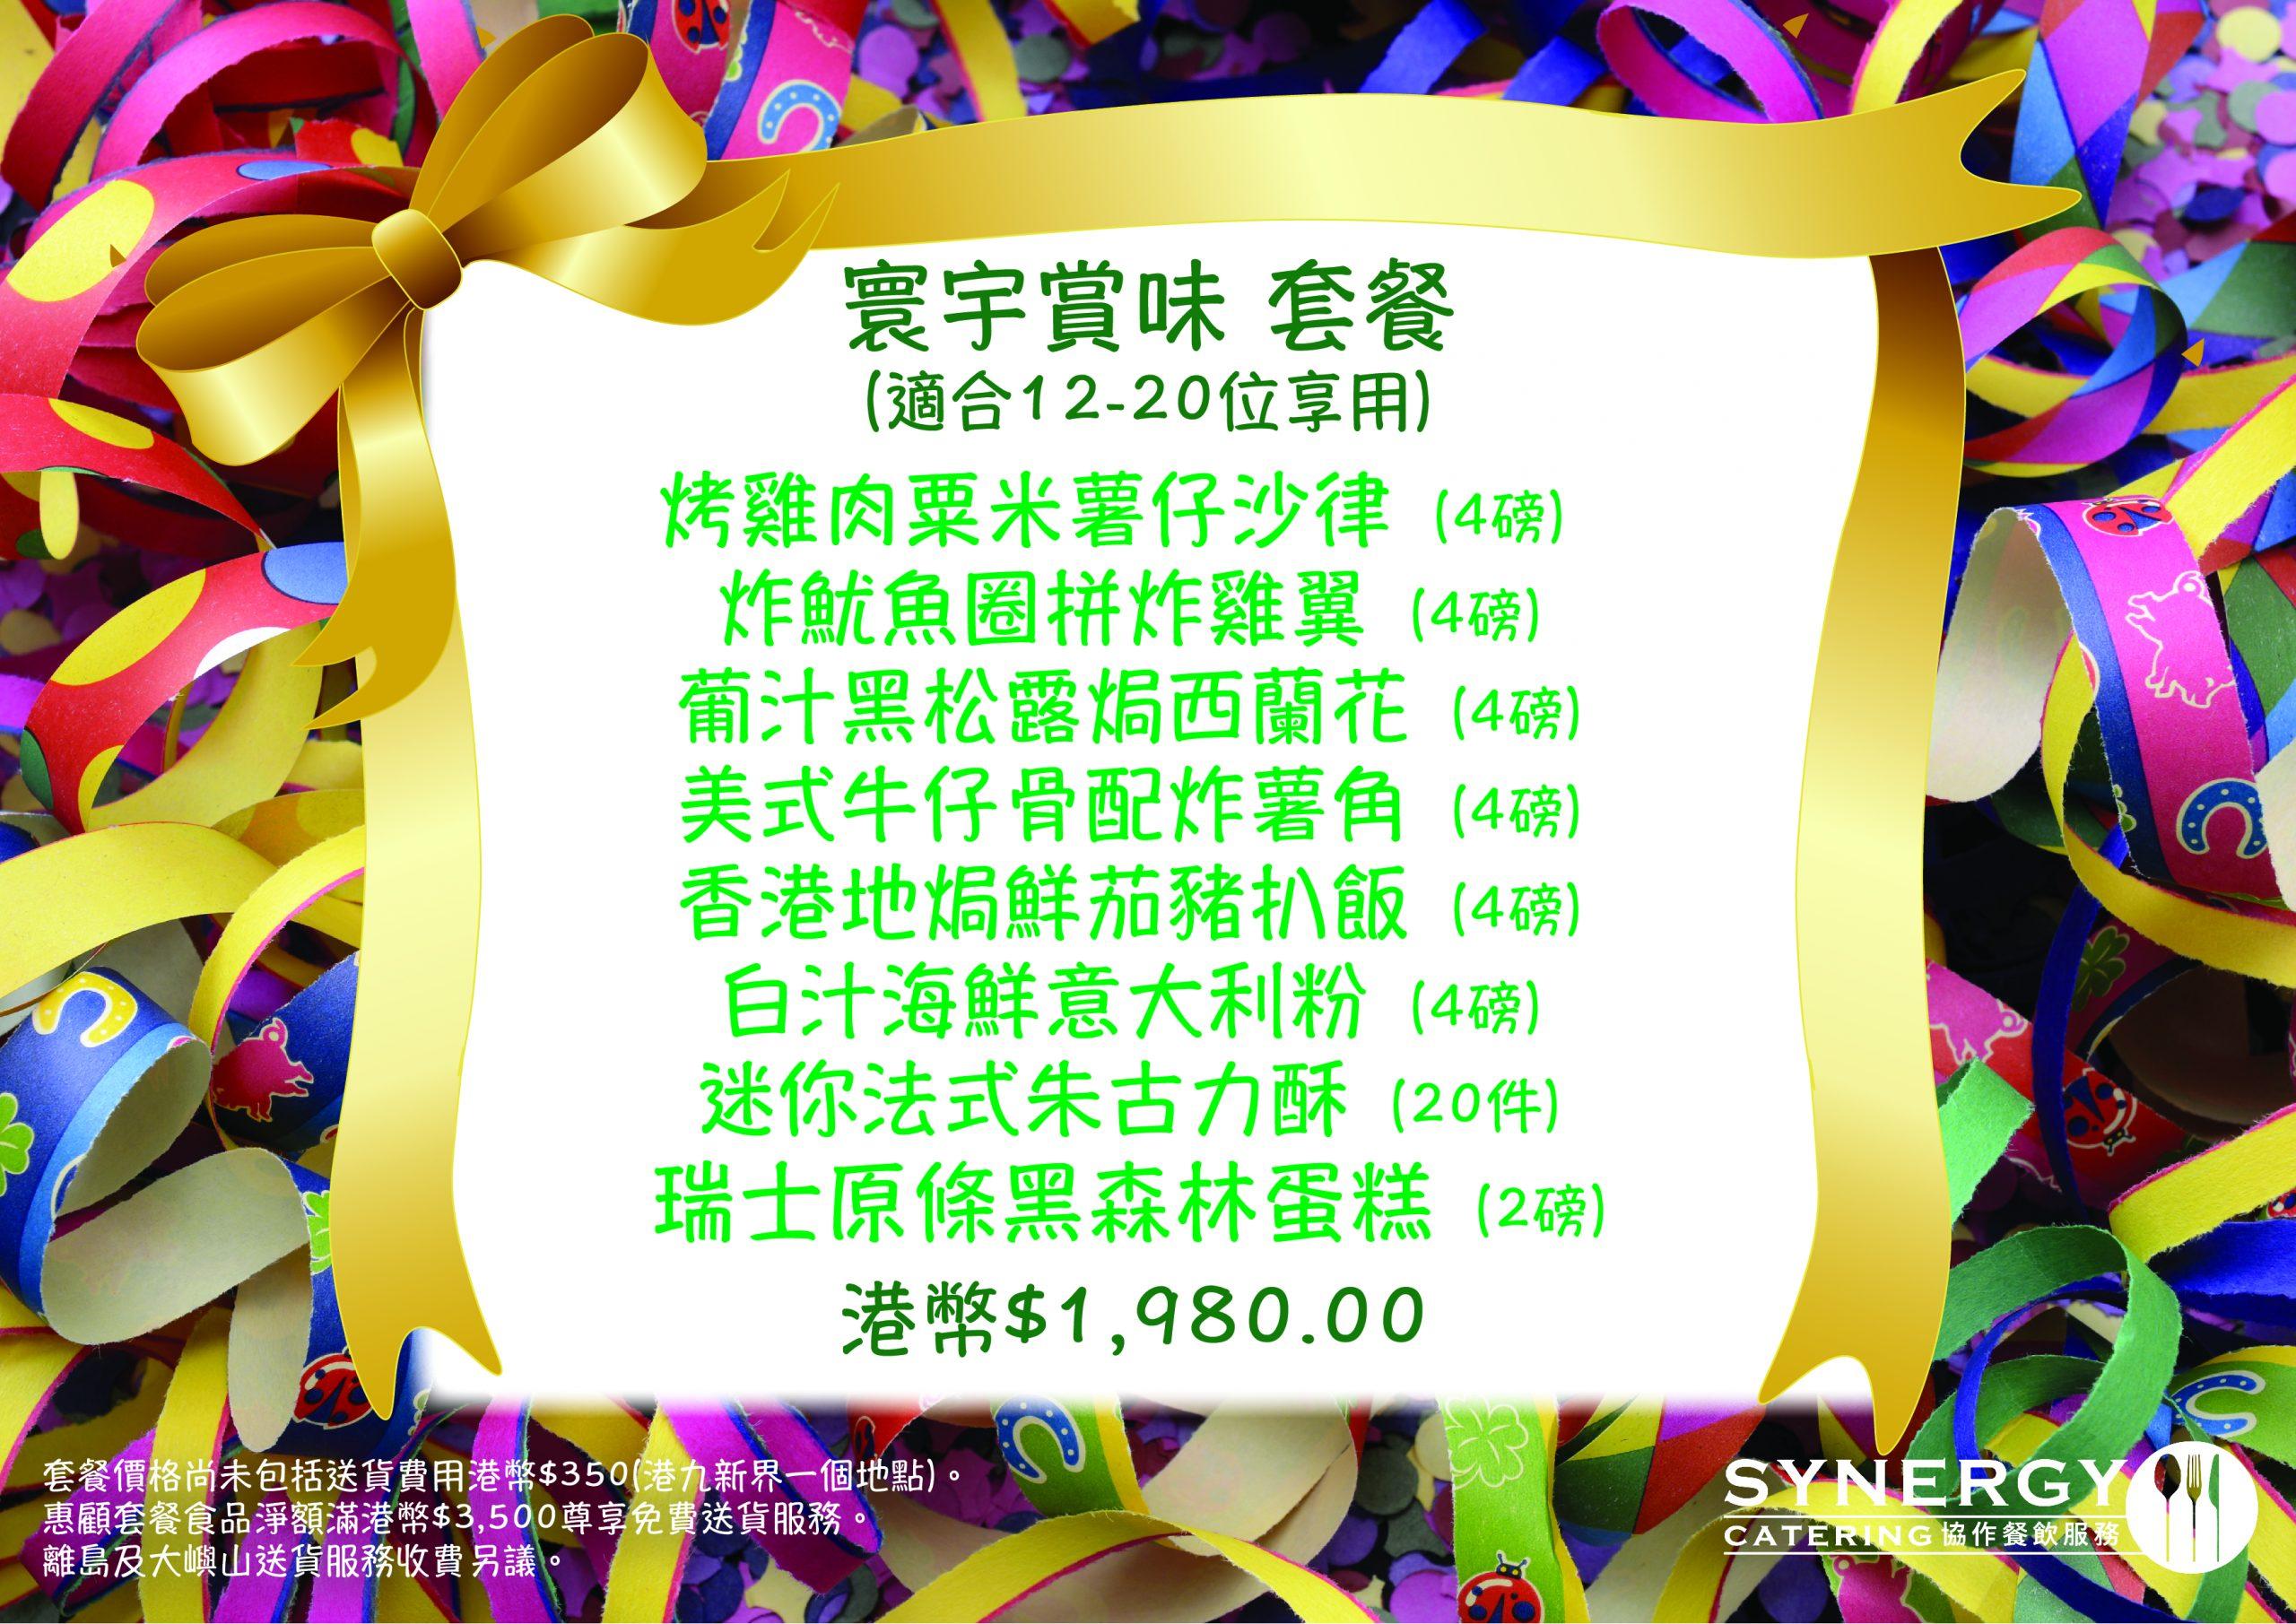 menu-photo